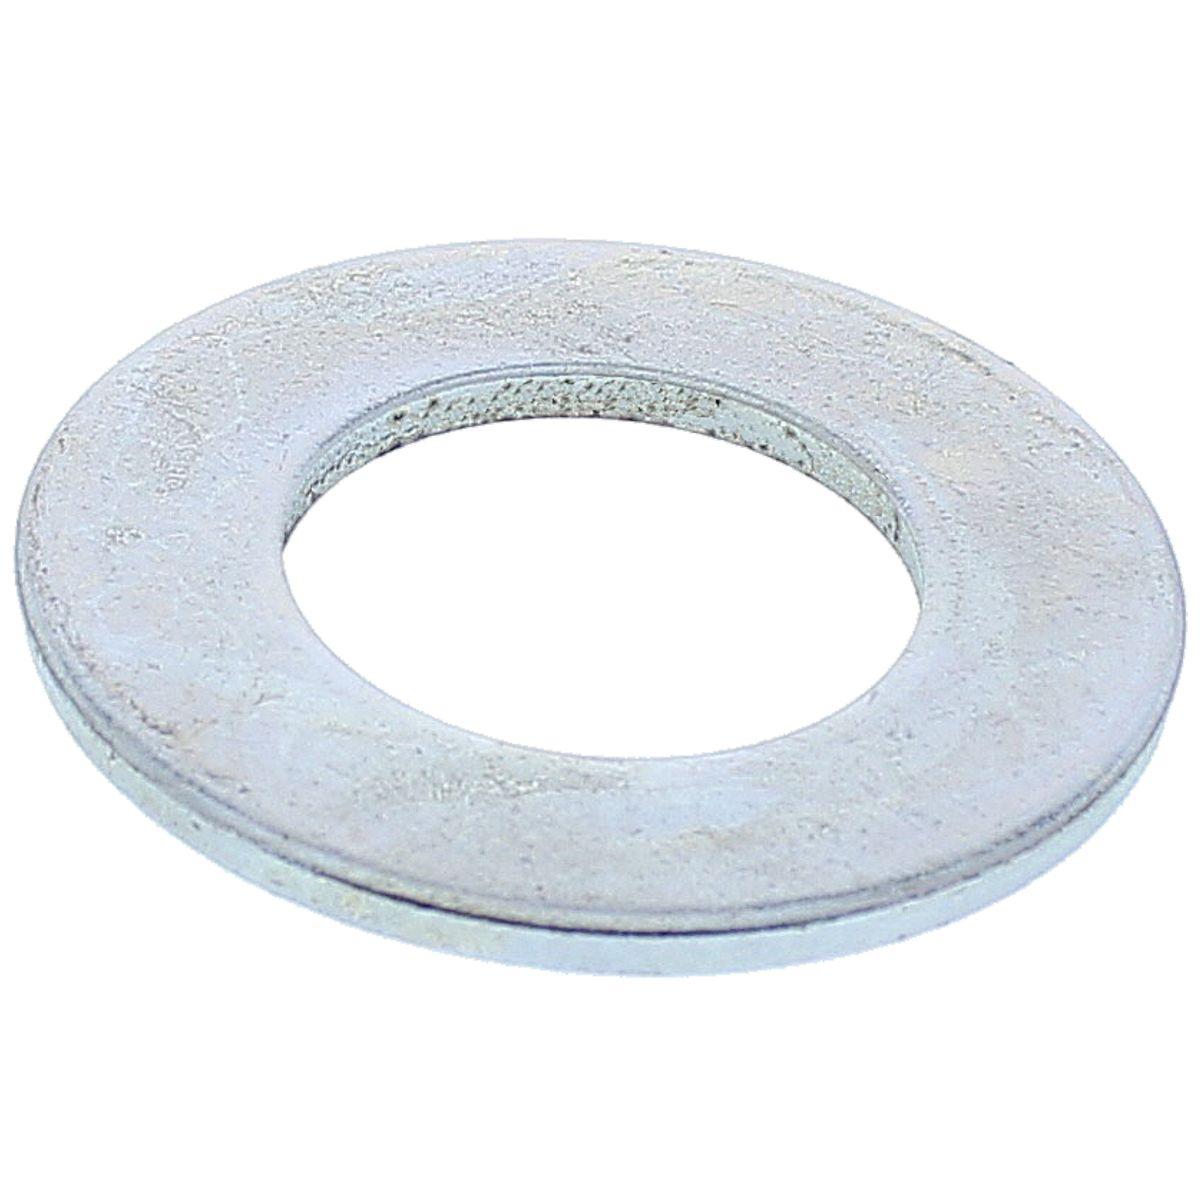 "#10 x 1/2"" x 3/64"" SAE Flat Washers — ASME B18.21.1, Zinc, 100/PKG"